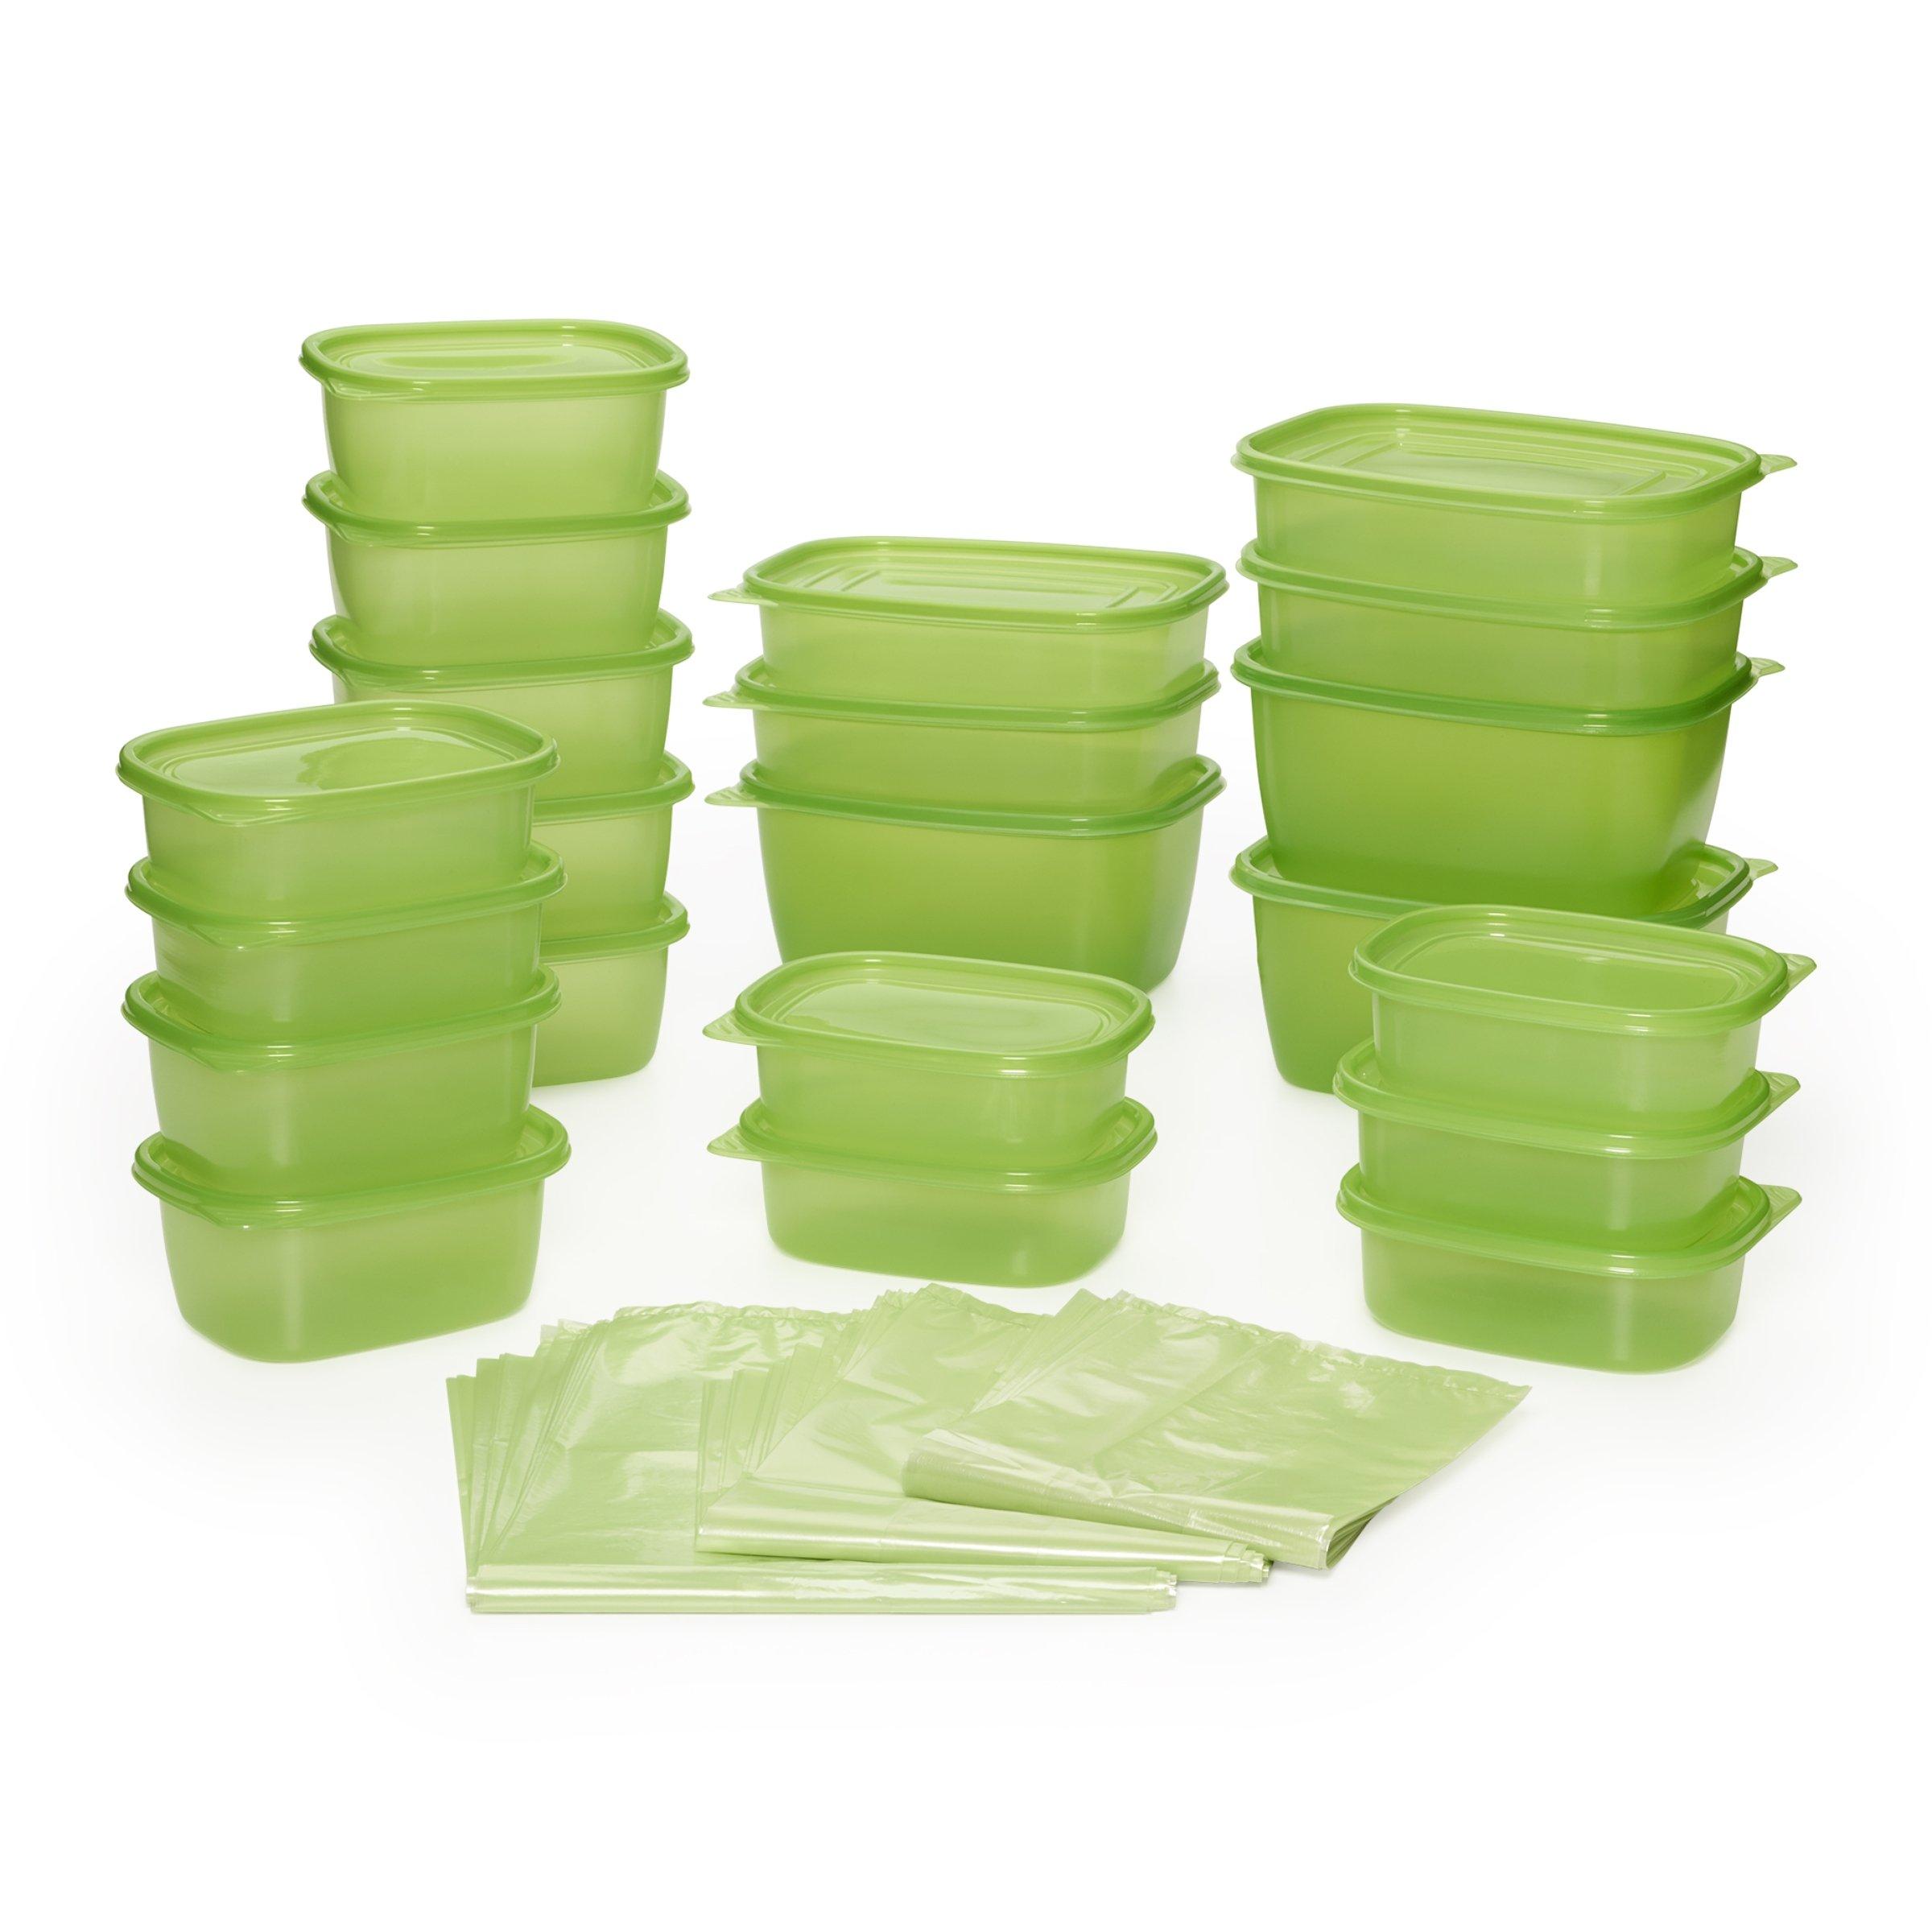 Debbie Meyer 74 Piece Greenbox Greenbag Set Green 74-Piece 2